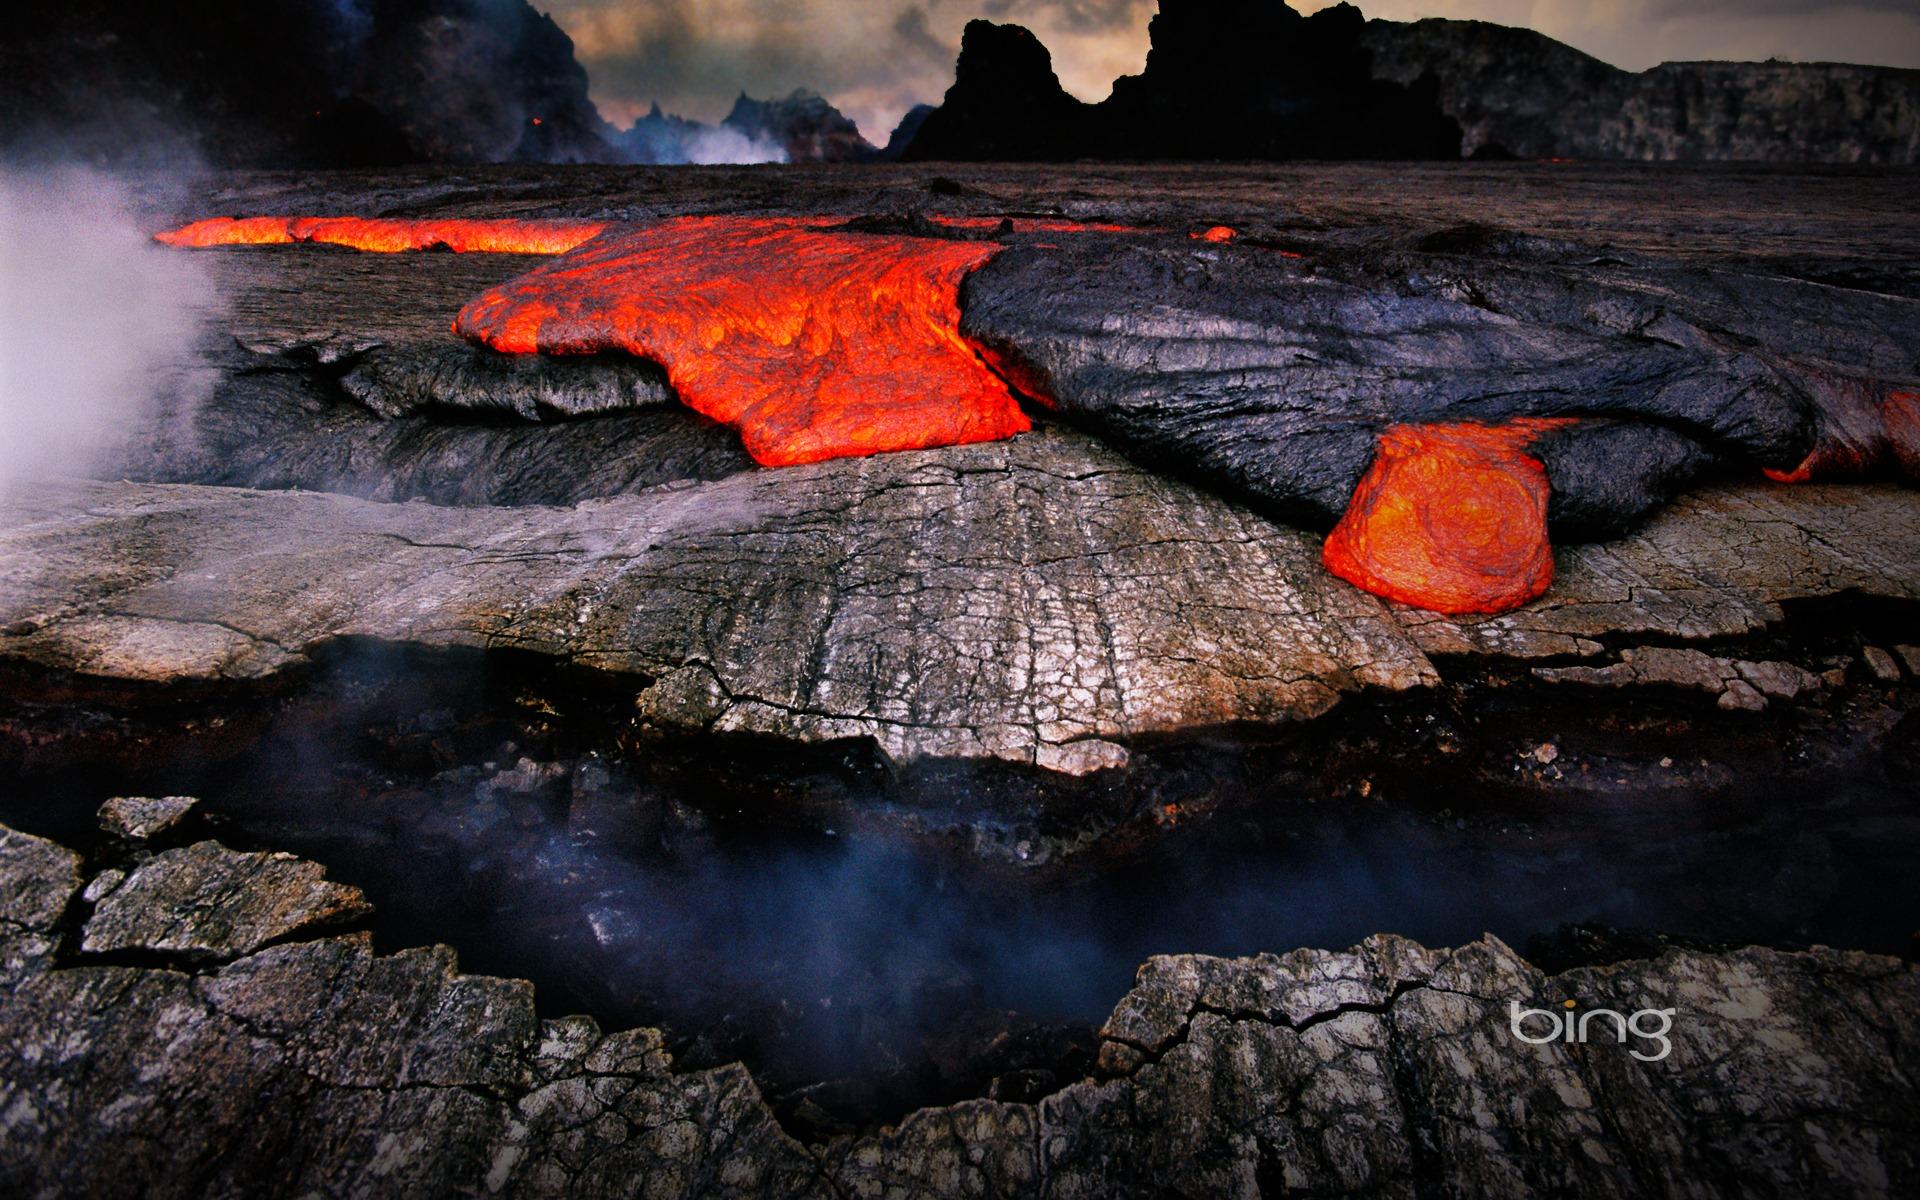 Windows 7 Bing Themes volcanoes lava widescreen HD wallpaper 1920x1200